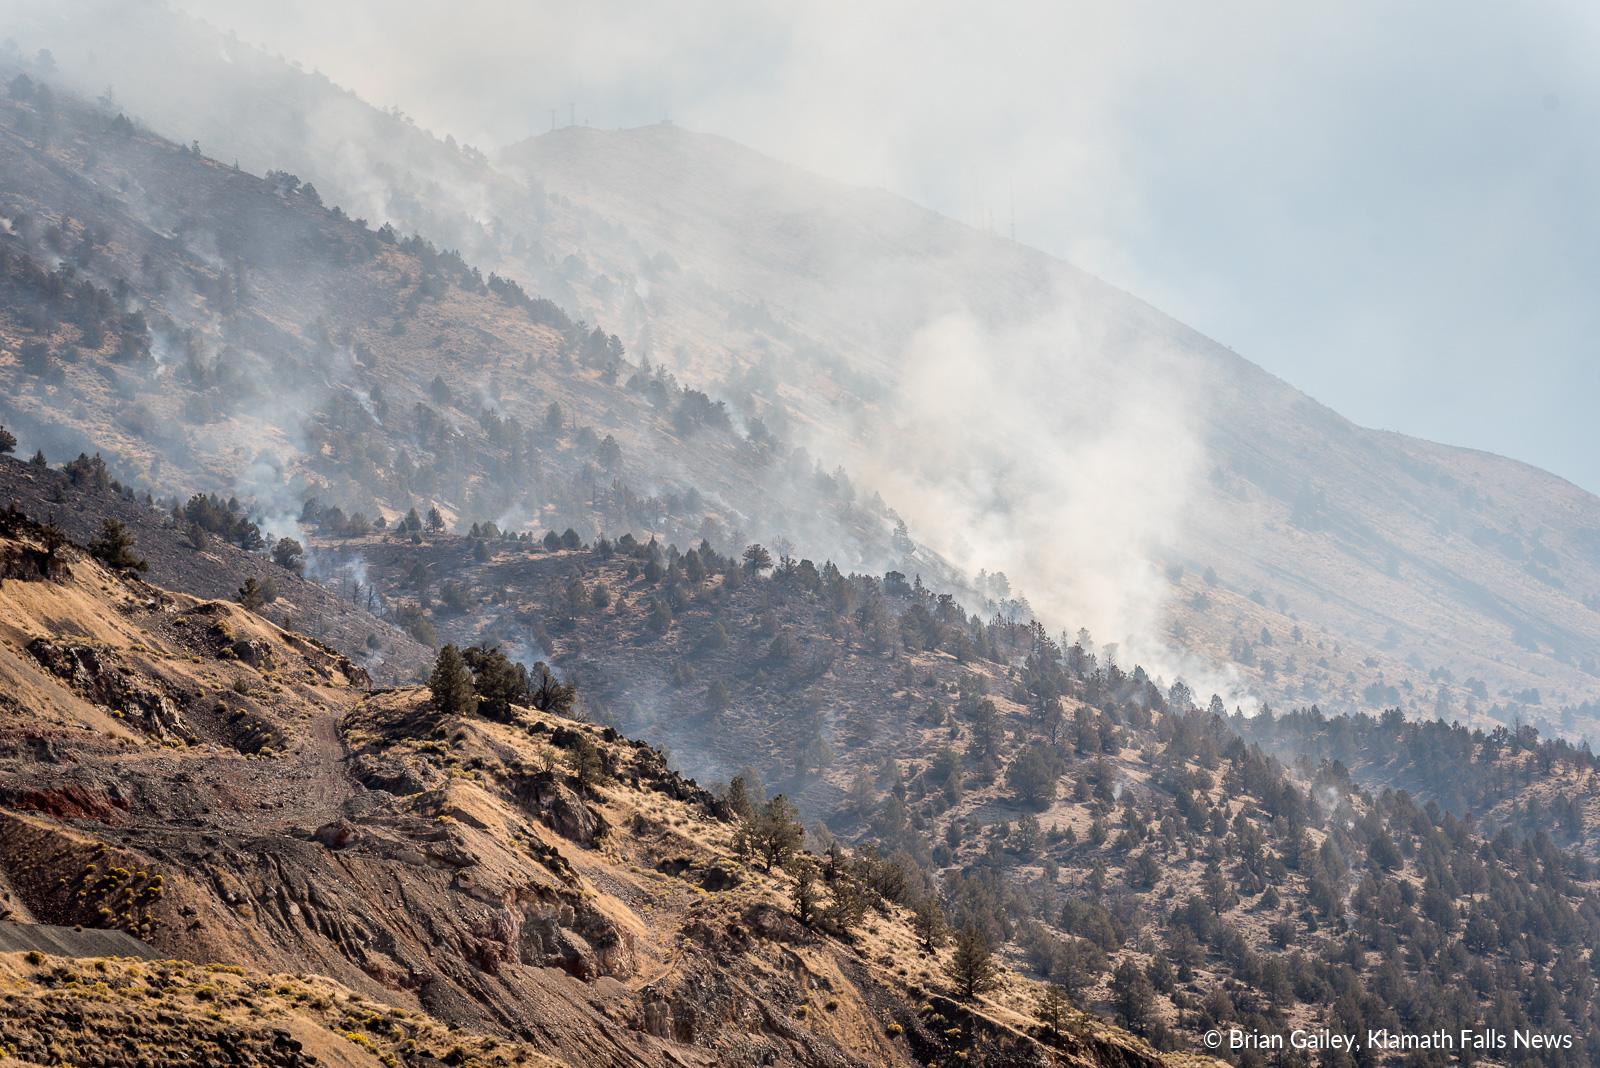 Stukel Fire. October 15, 2018 (Brian Gailey)